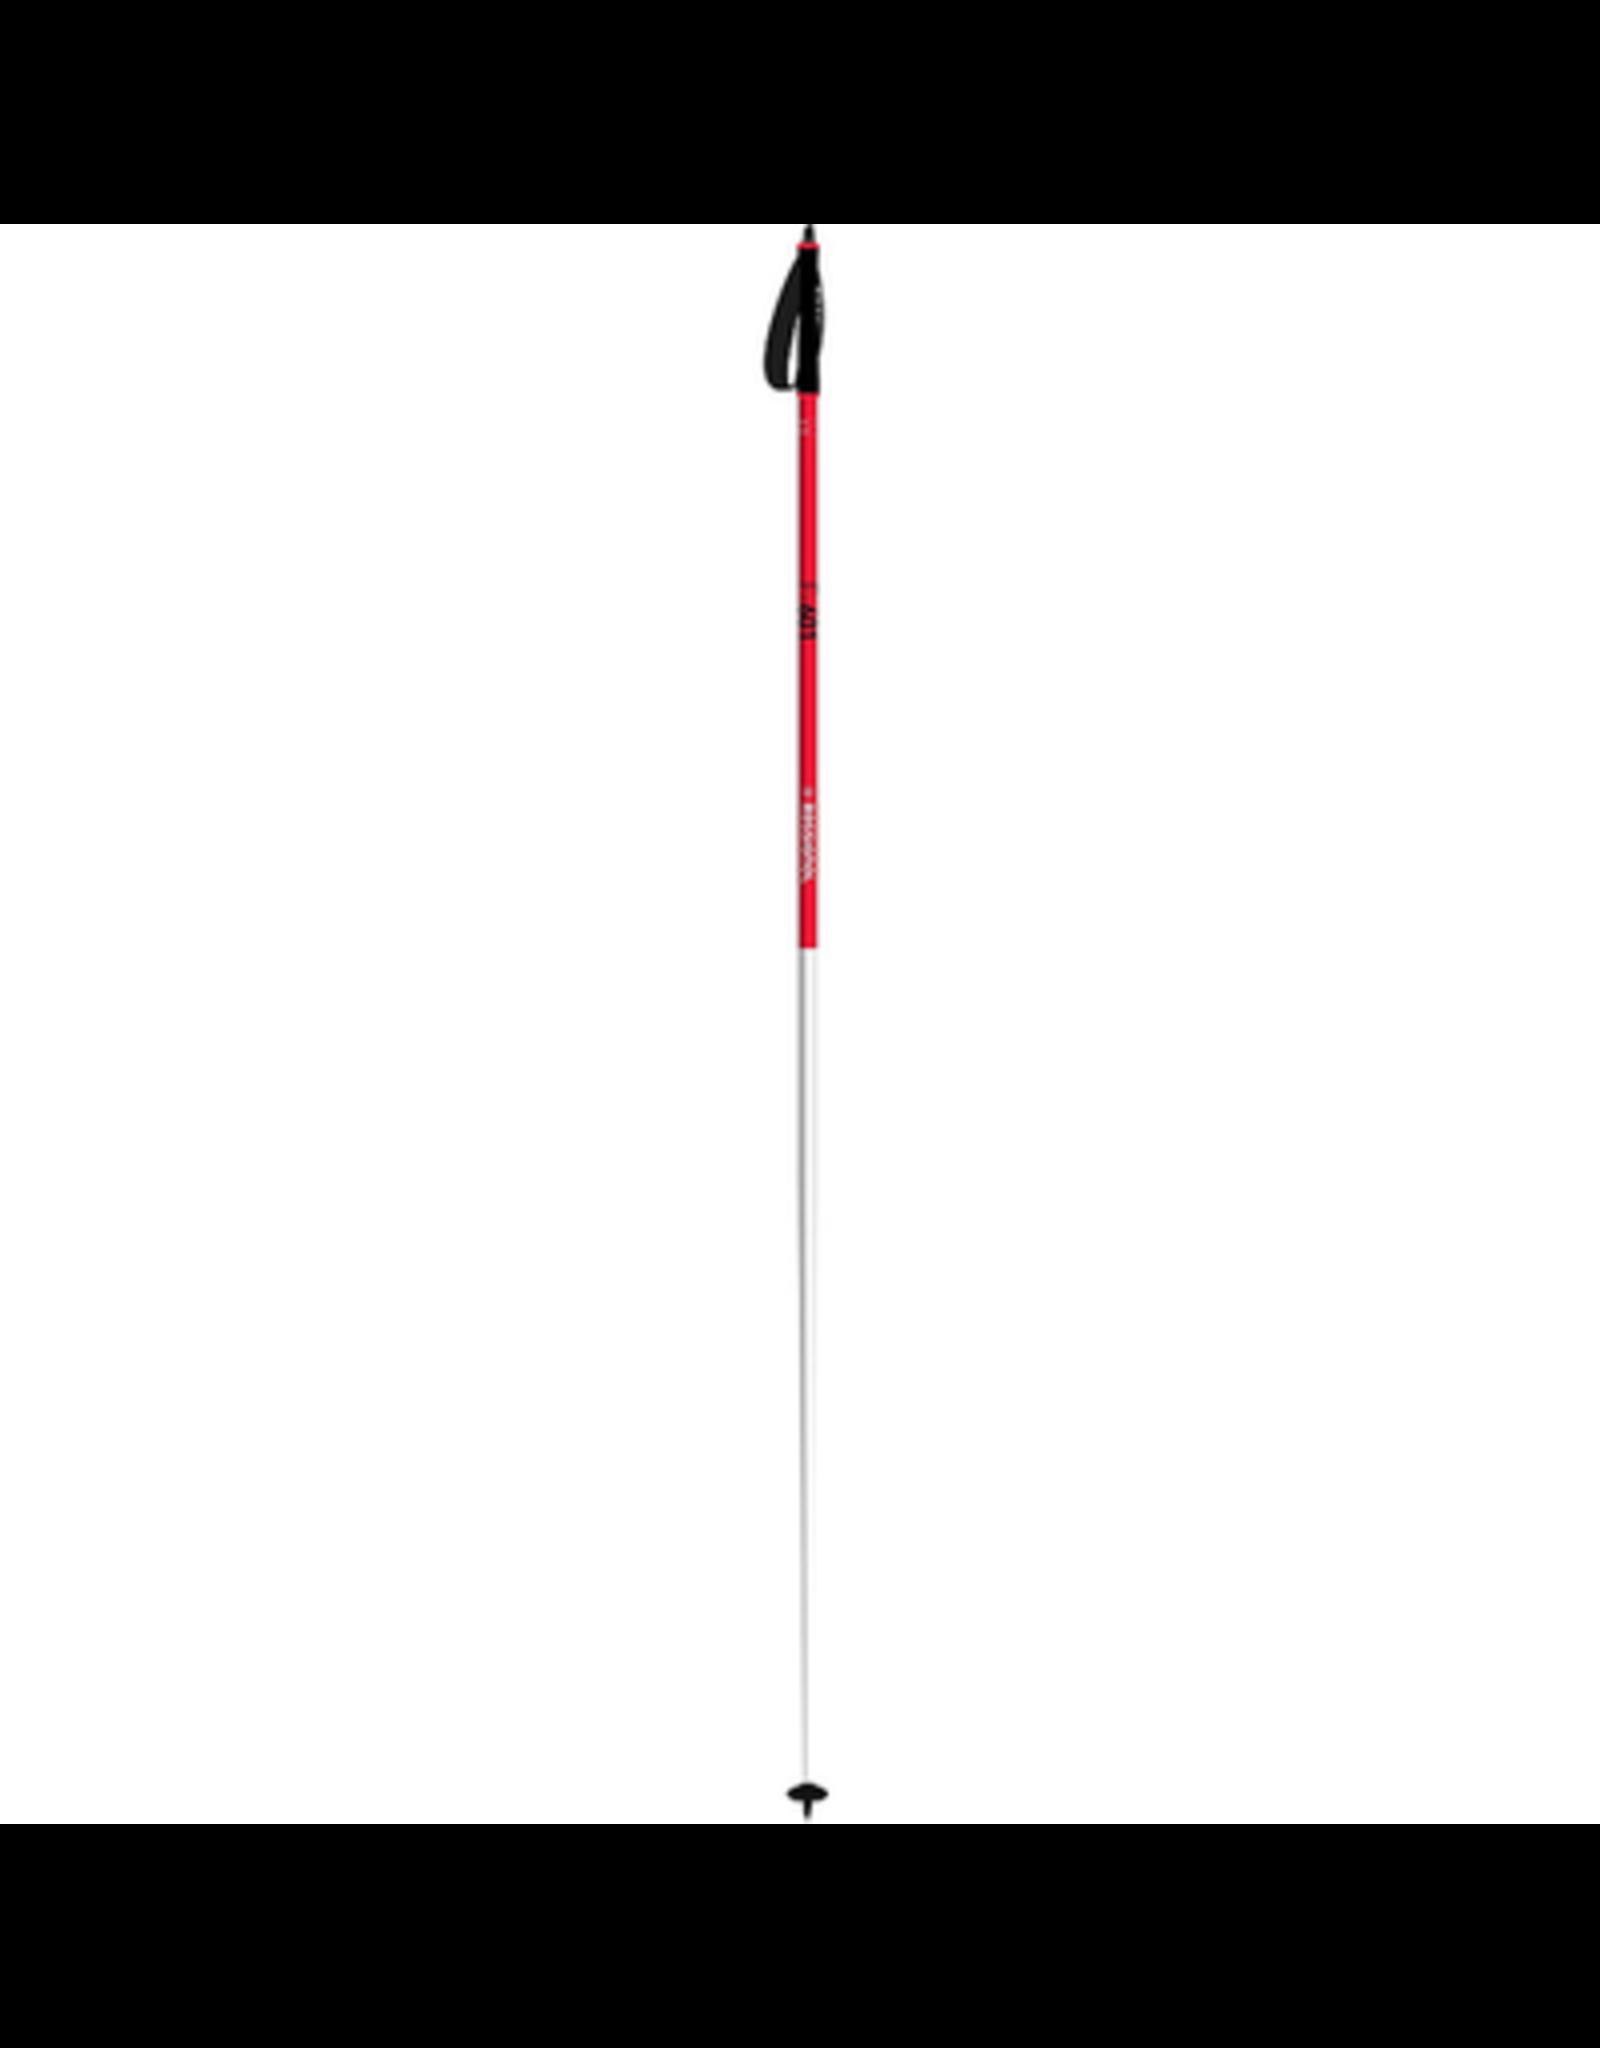 ROSSIGNOL CANADA ROSSIGNOL F 601 JR Pole